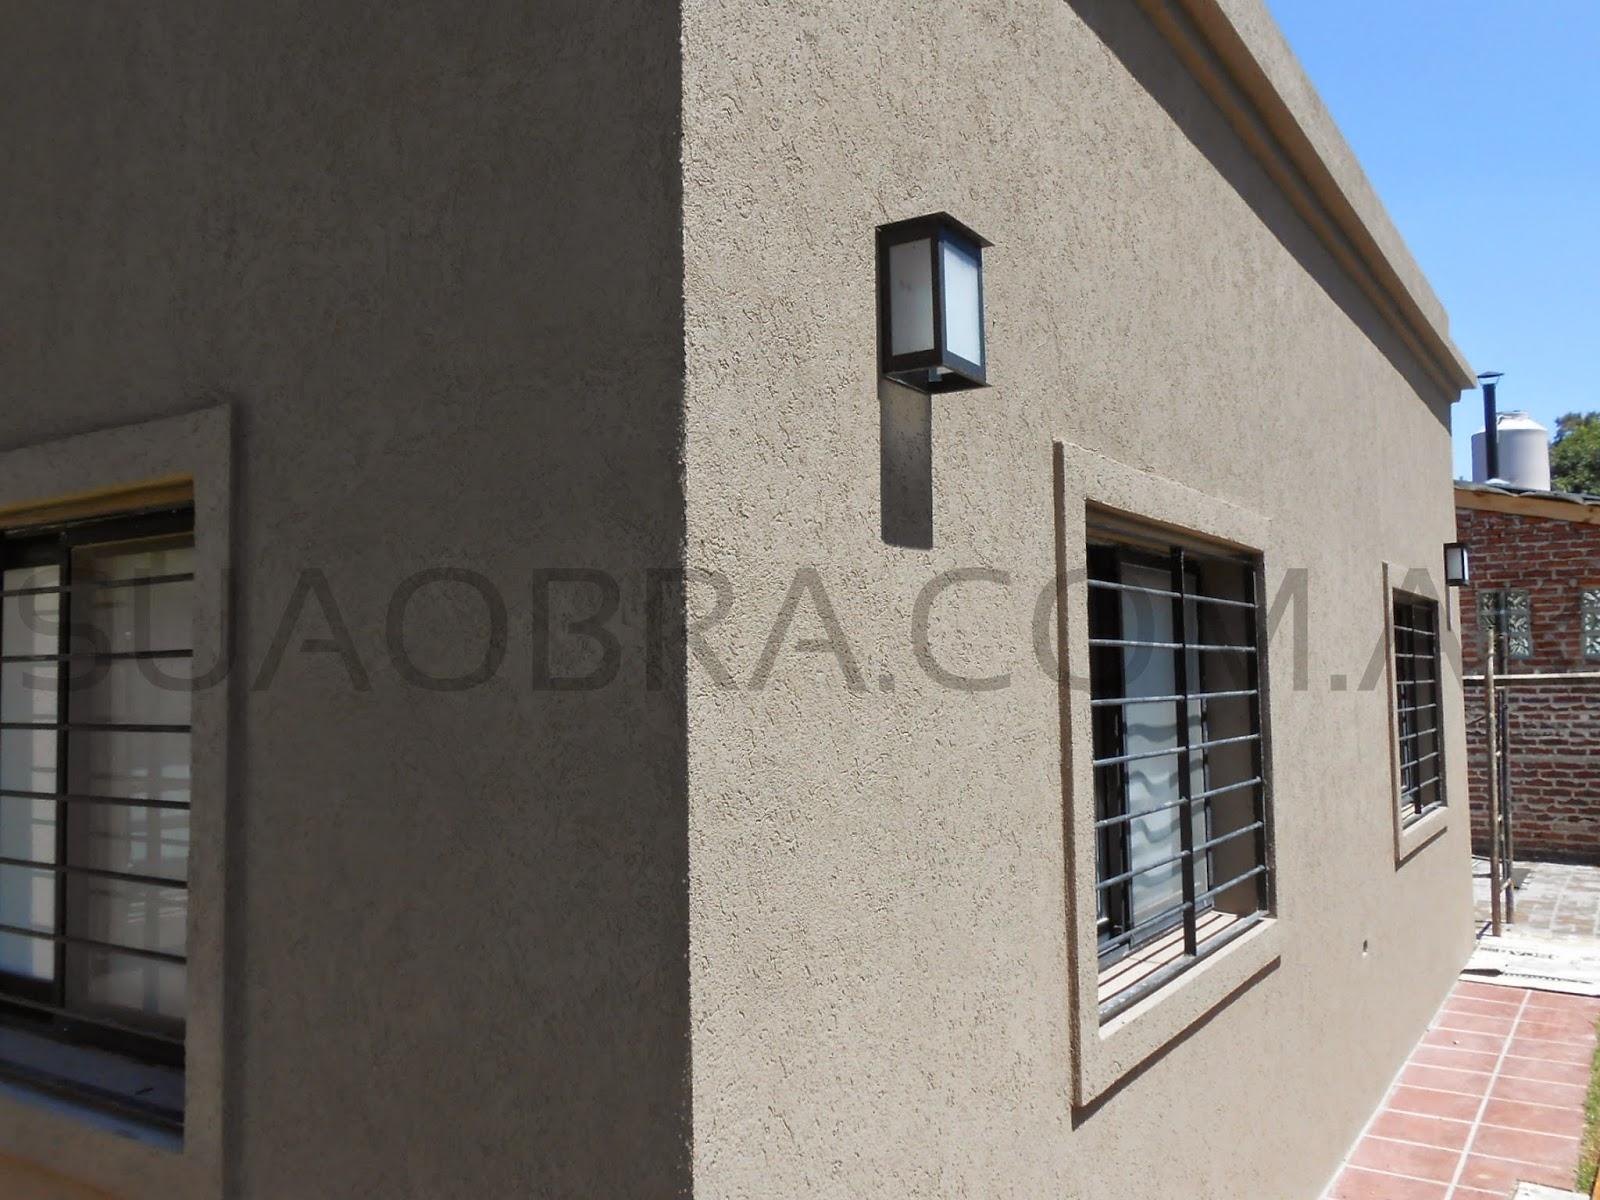 revoque de paredes quimtex exterior colocador tarquini colores revear revestimiento paredes - Revestimiento Exterior